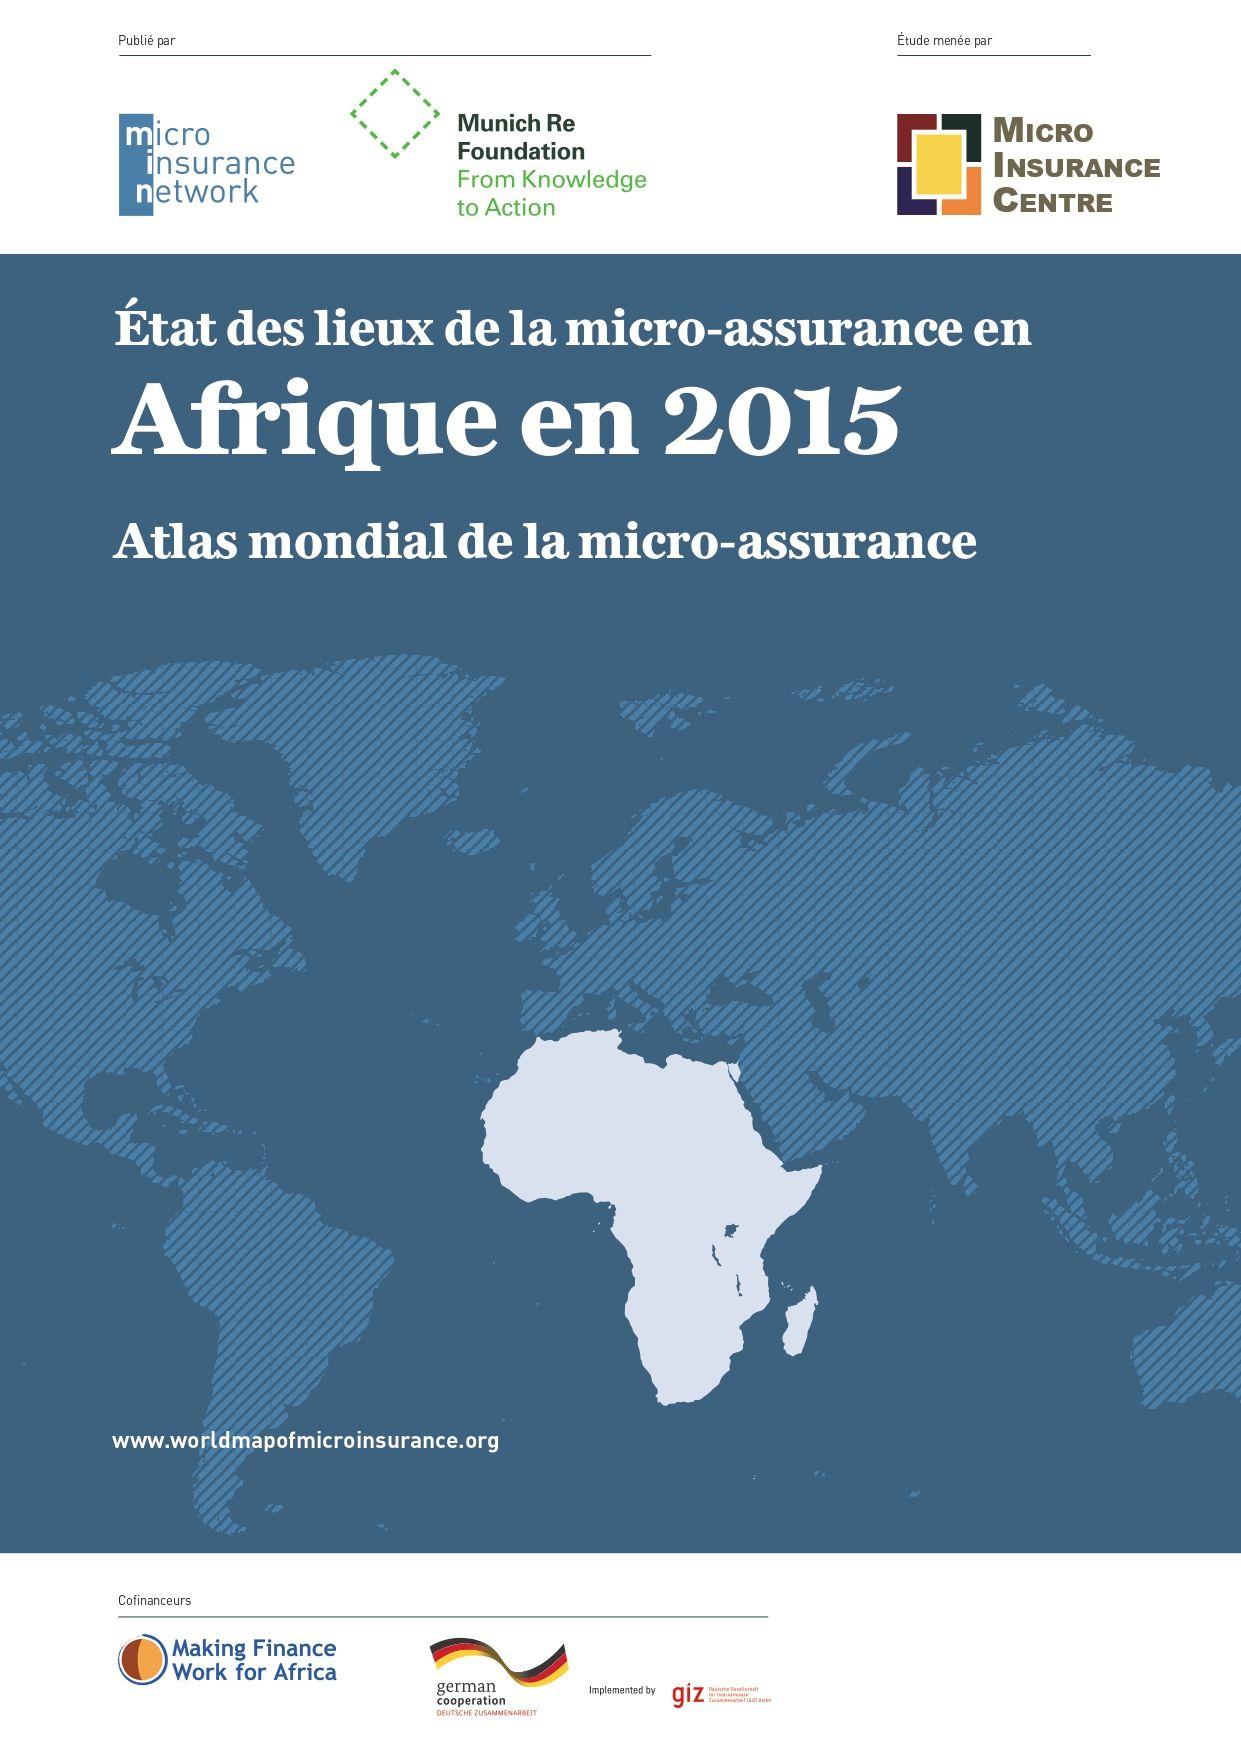 Microinsurance Network_Africa landscape full report-FR-1_page-0001.jpg